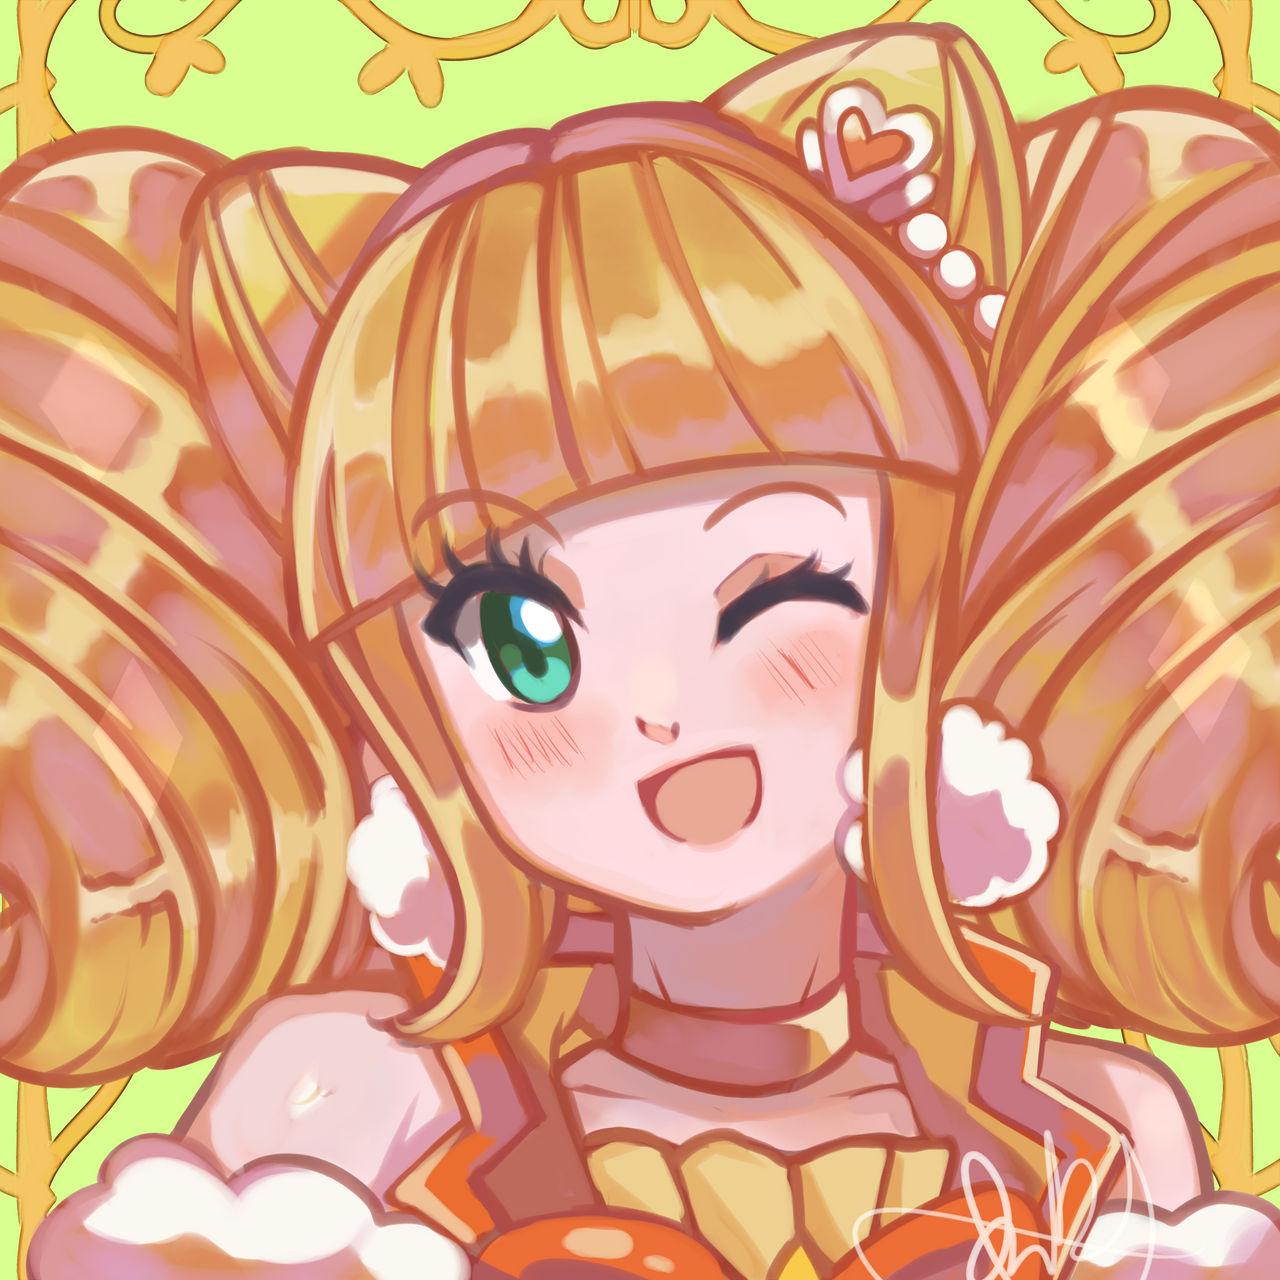 Cure Sparkle - Healin' Good Pretty Cure